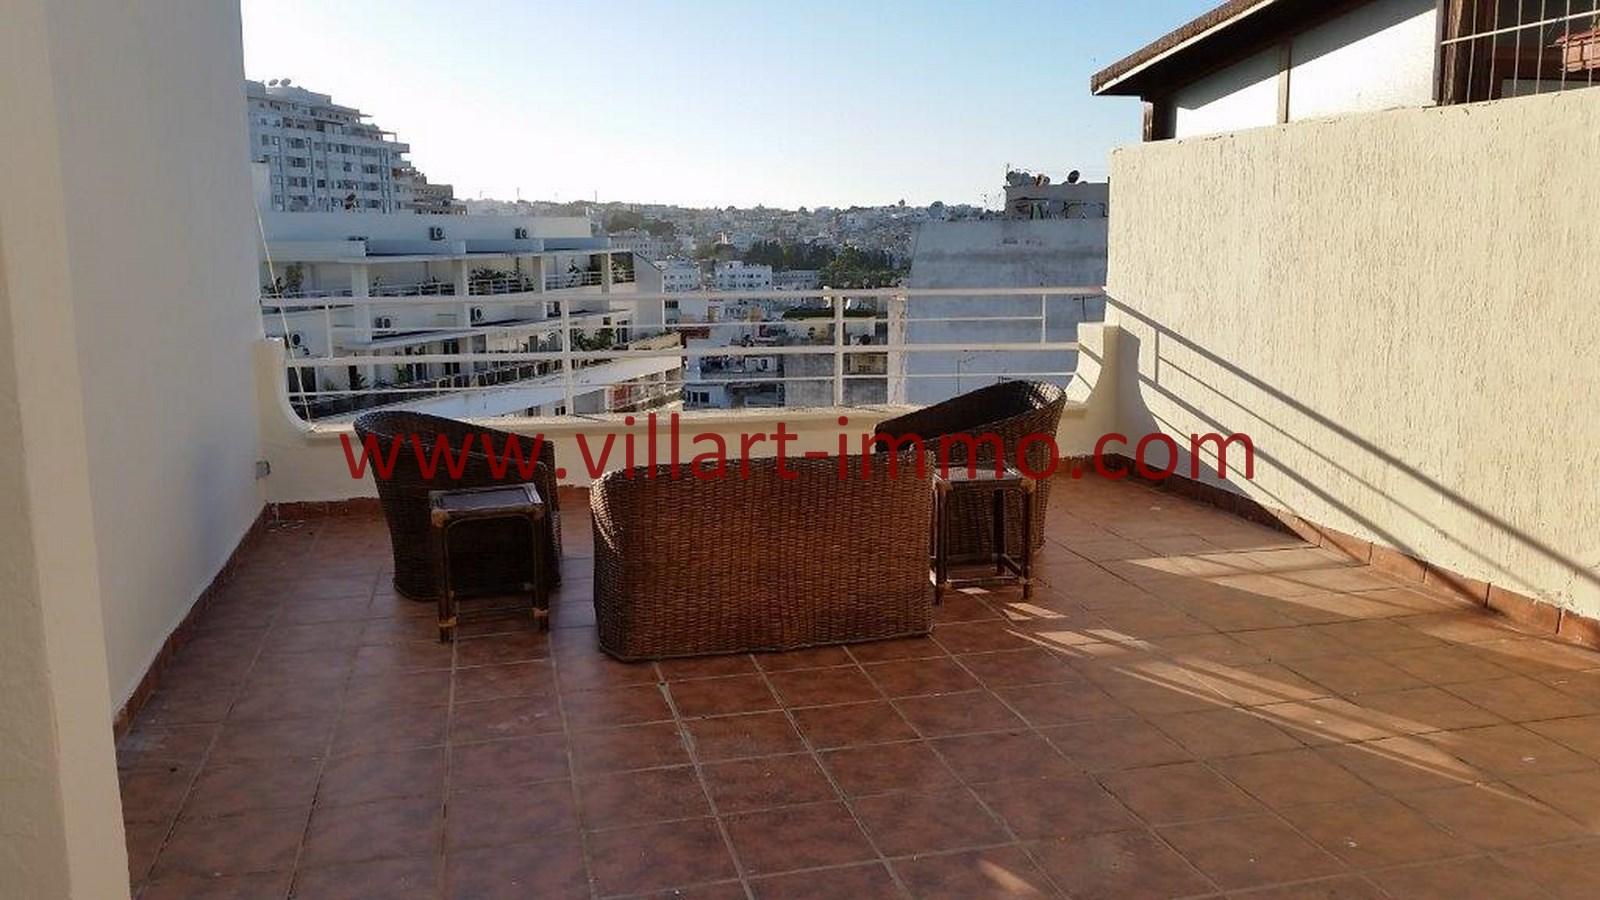 8-Vente-Appartement-Tanger-Centre-De-Ville-Terrasse-VA518-Villart Immo